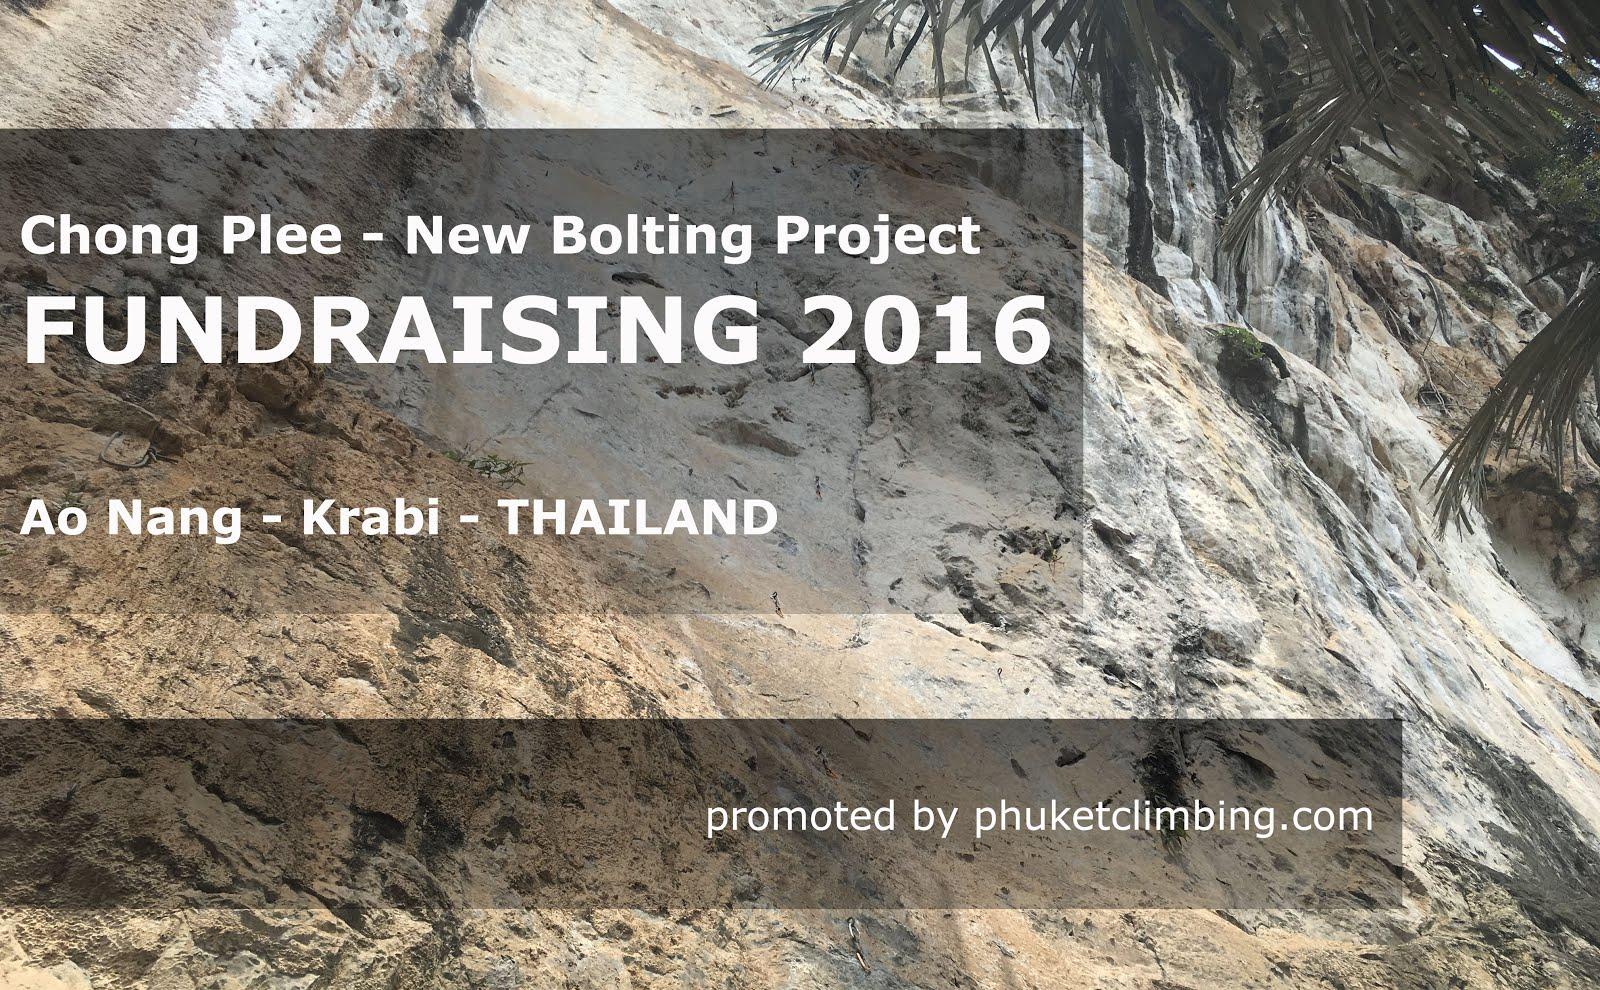 Chong Plee - FUNDRAISING